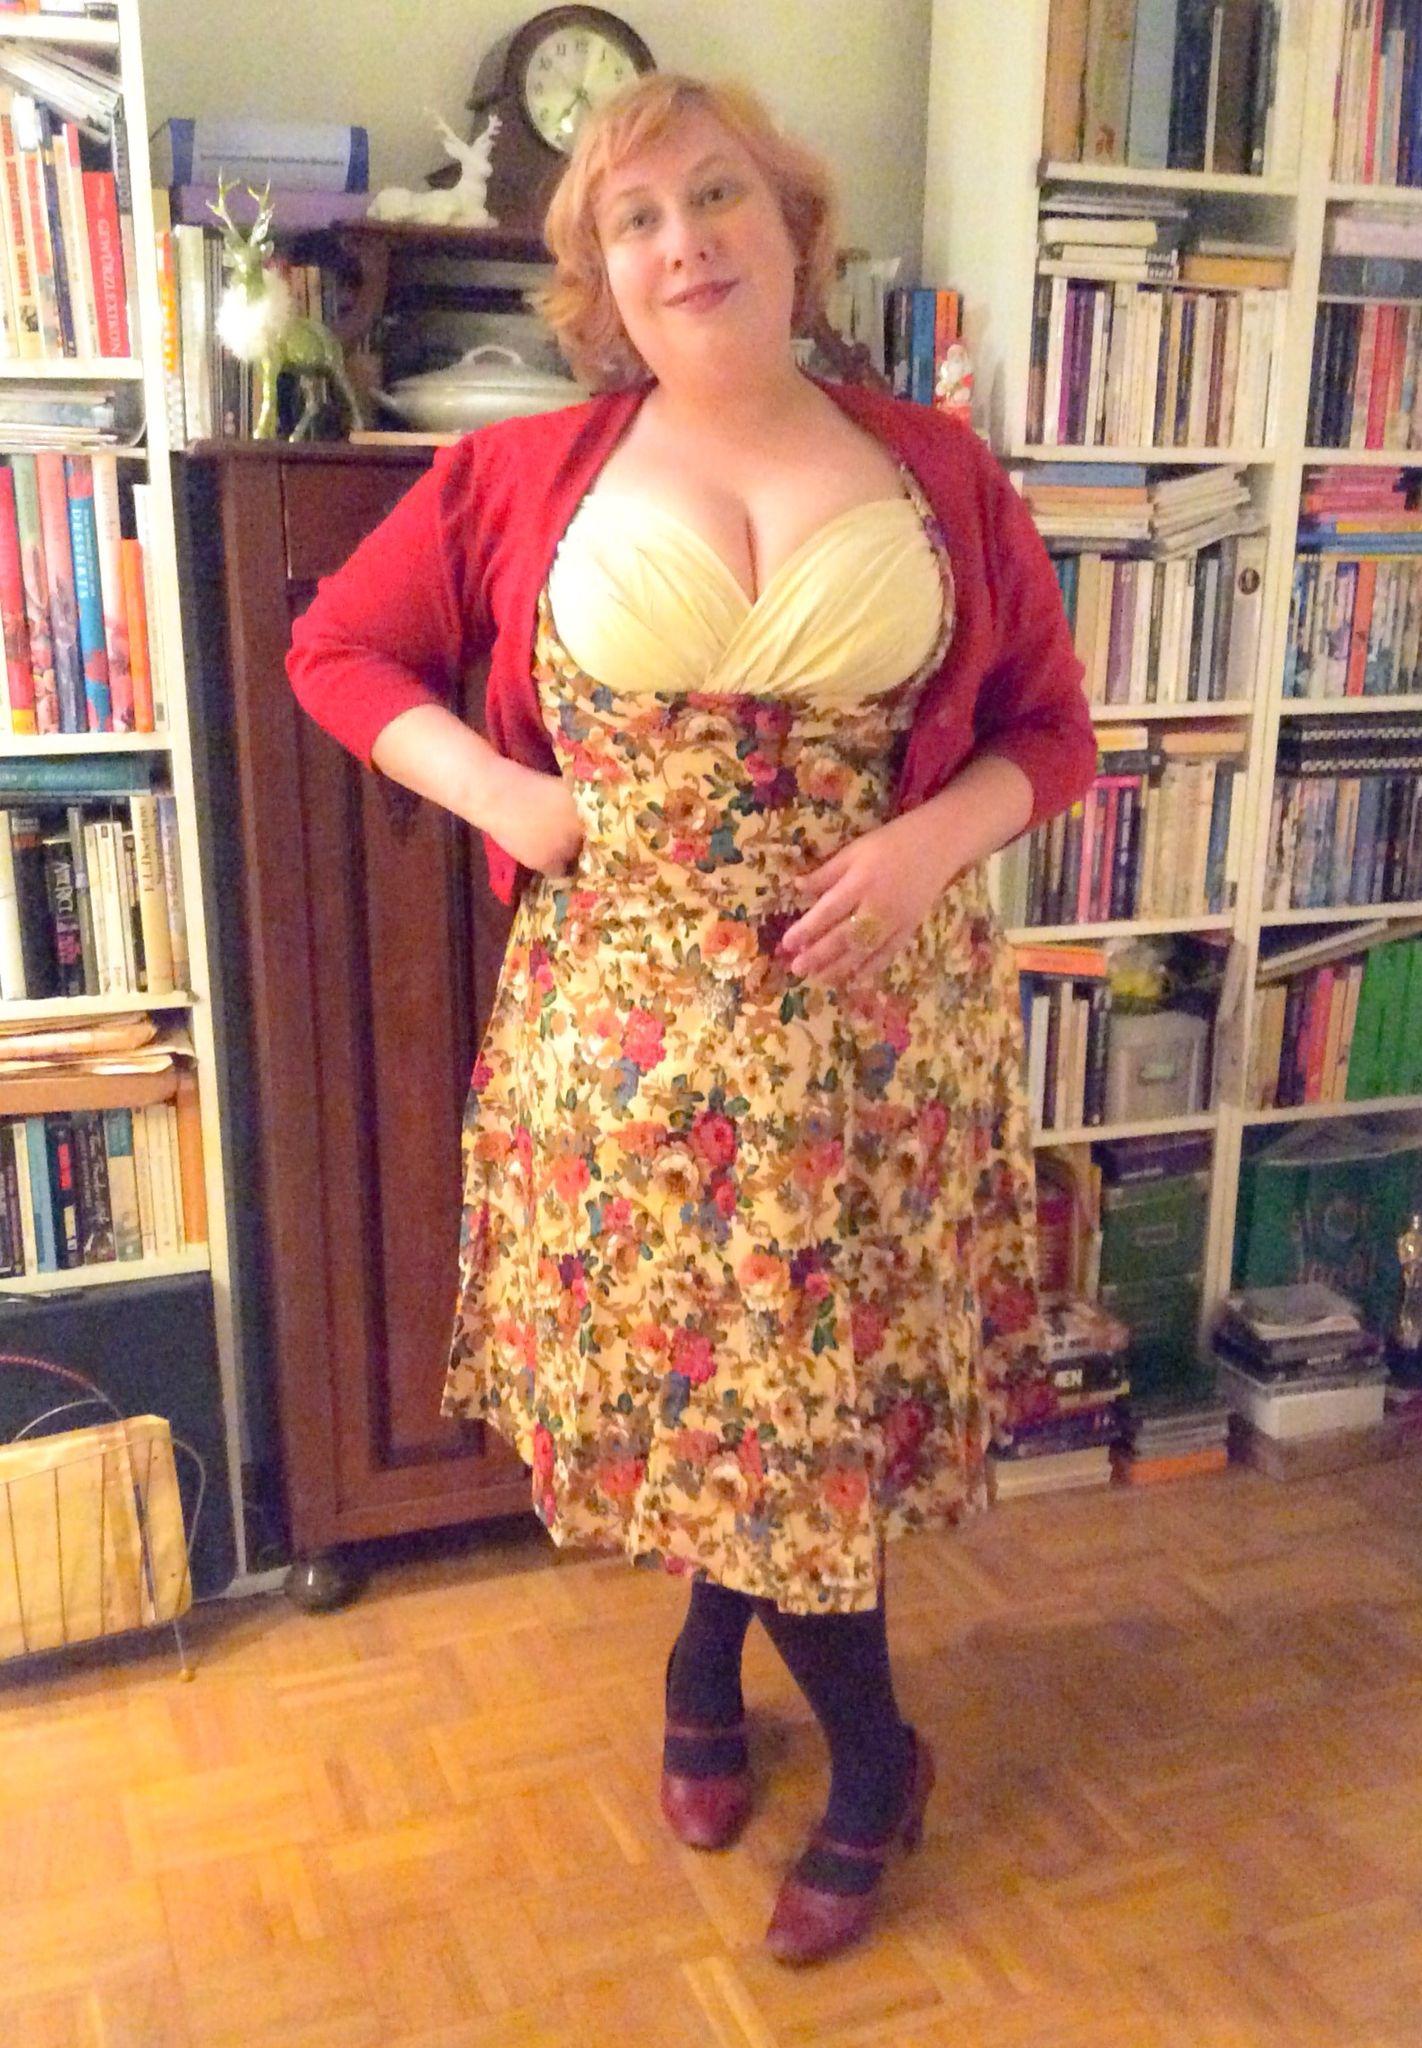 Ophelia Dress by #LindyBop Lindy Bop, cardie by #ModCloth ...